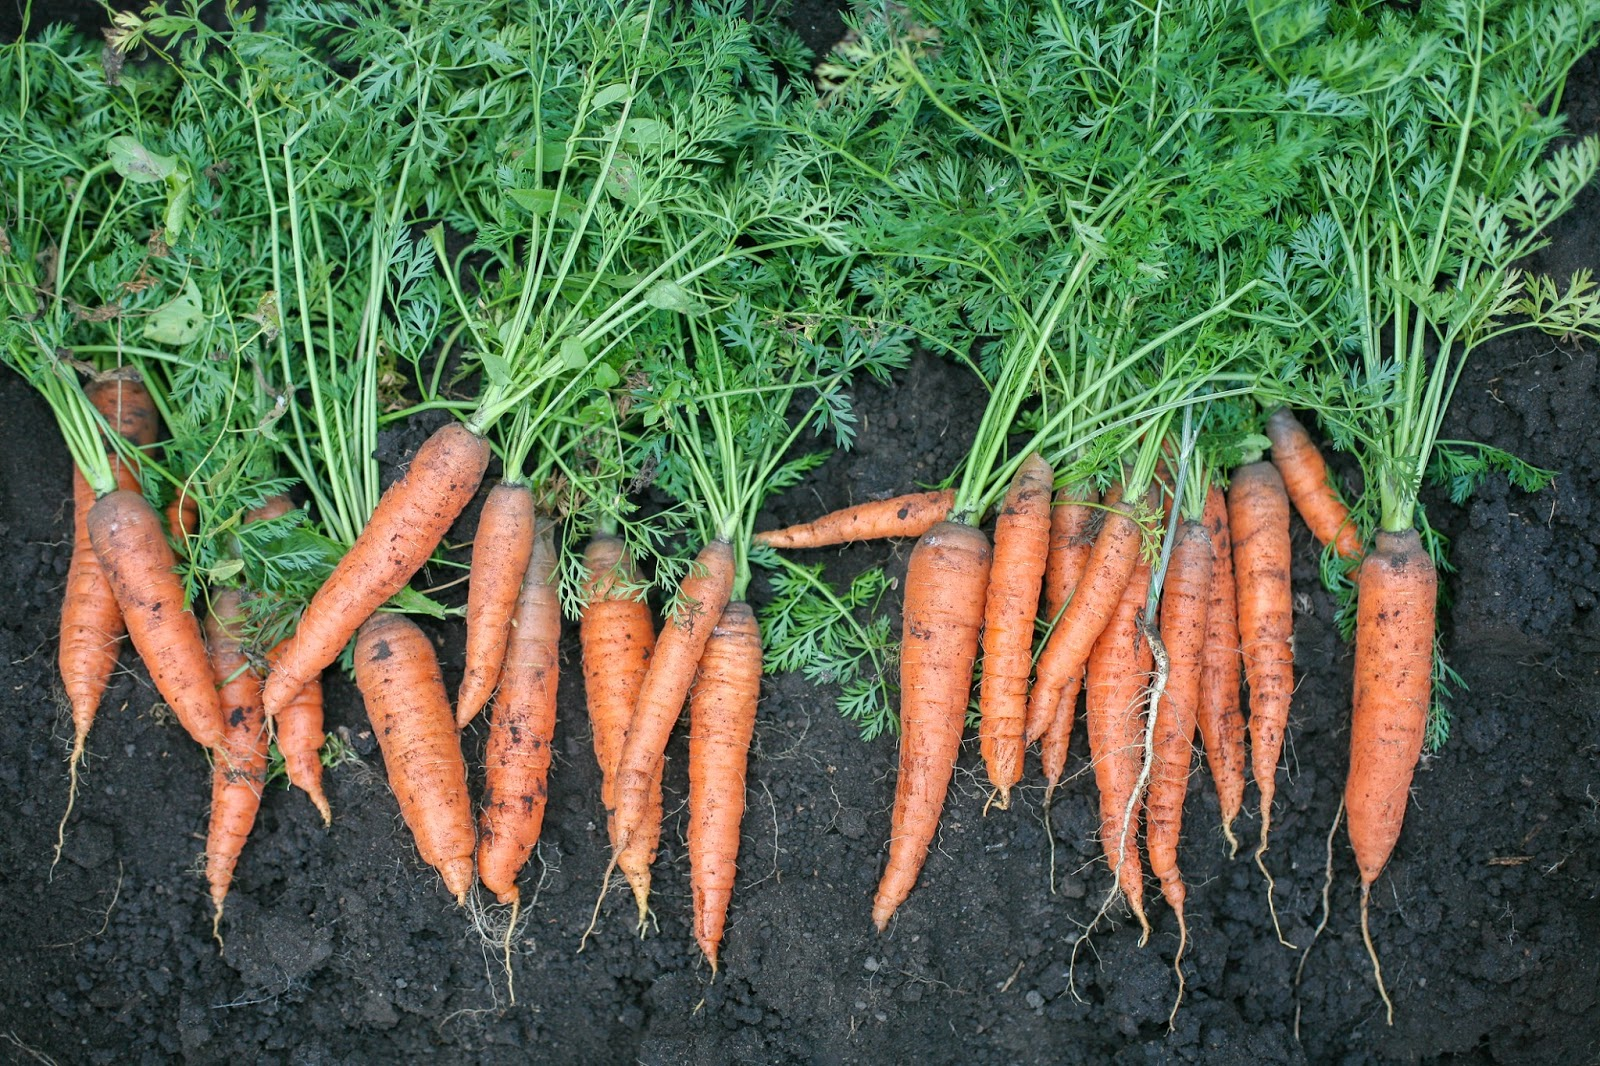 Raw Edible Plants: Carrots (Daucus carota ssp. sativus)